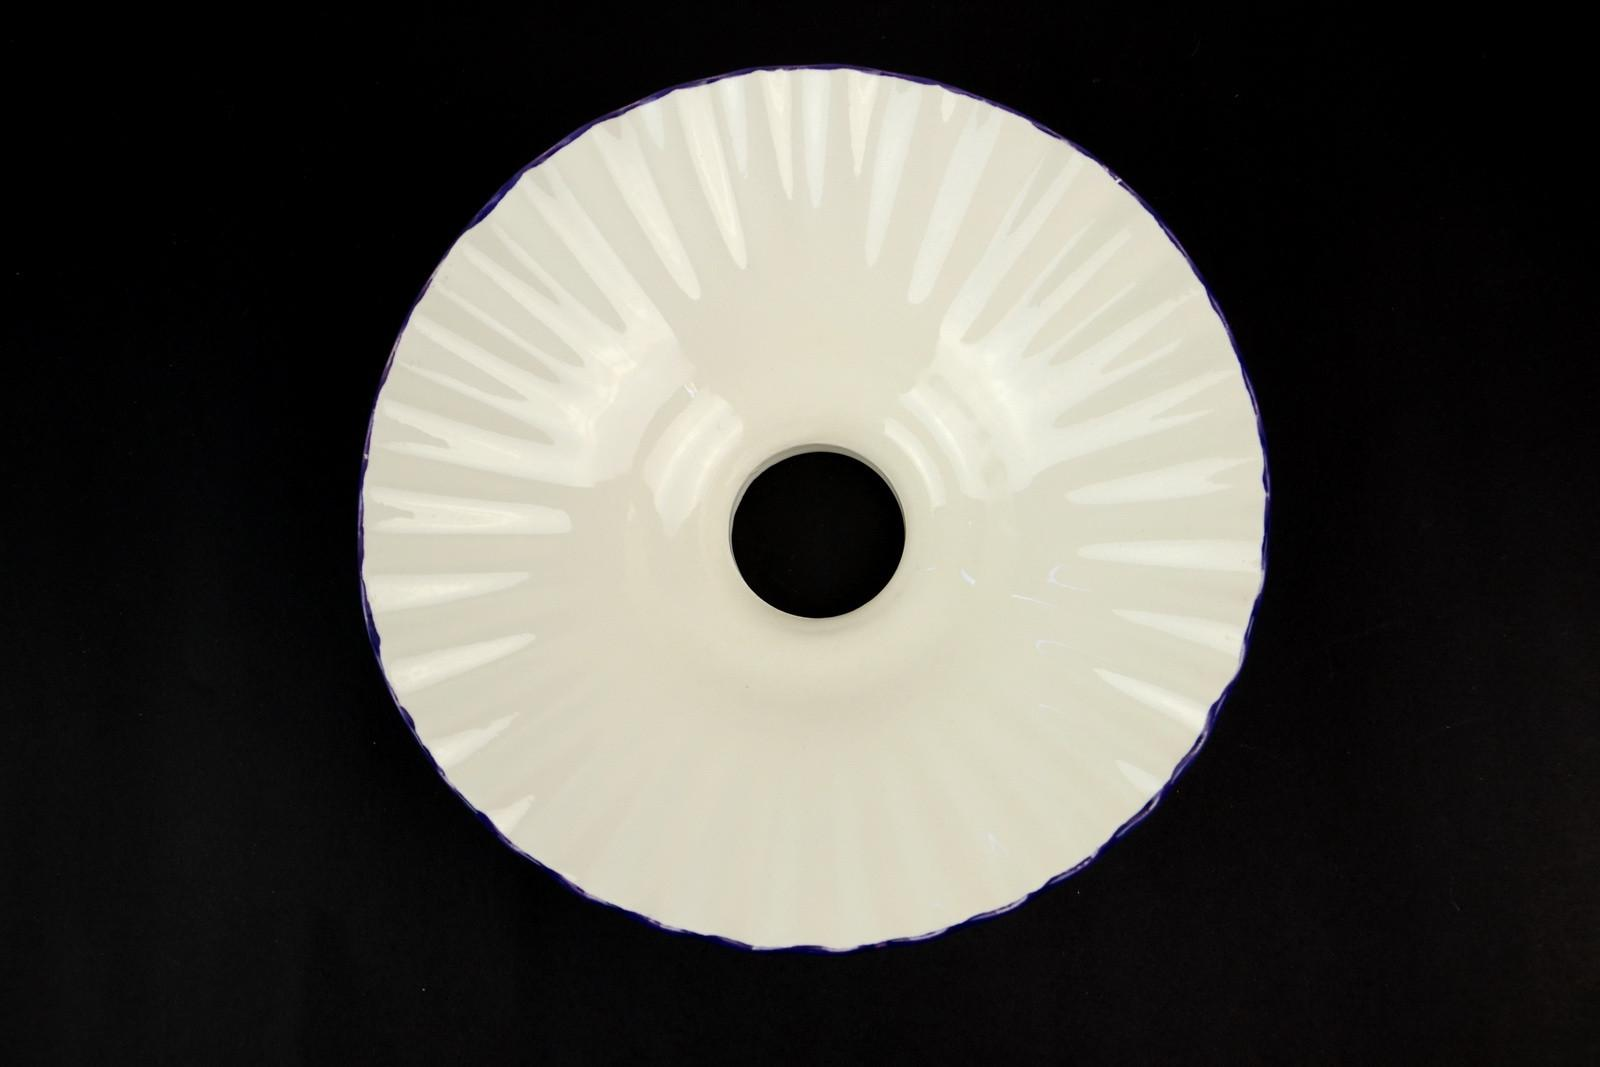 pv101b-piatto-luce-in-ceramica-cm-19-1,1345.jpg?WebbinsCacheCounter=1